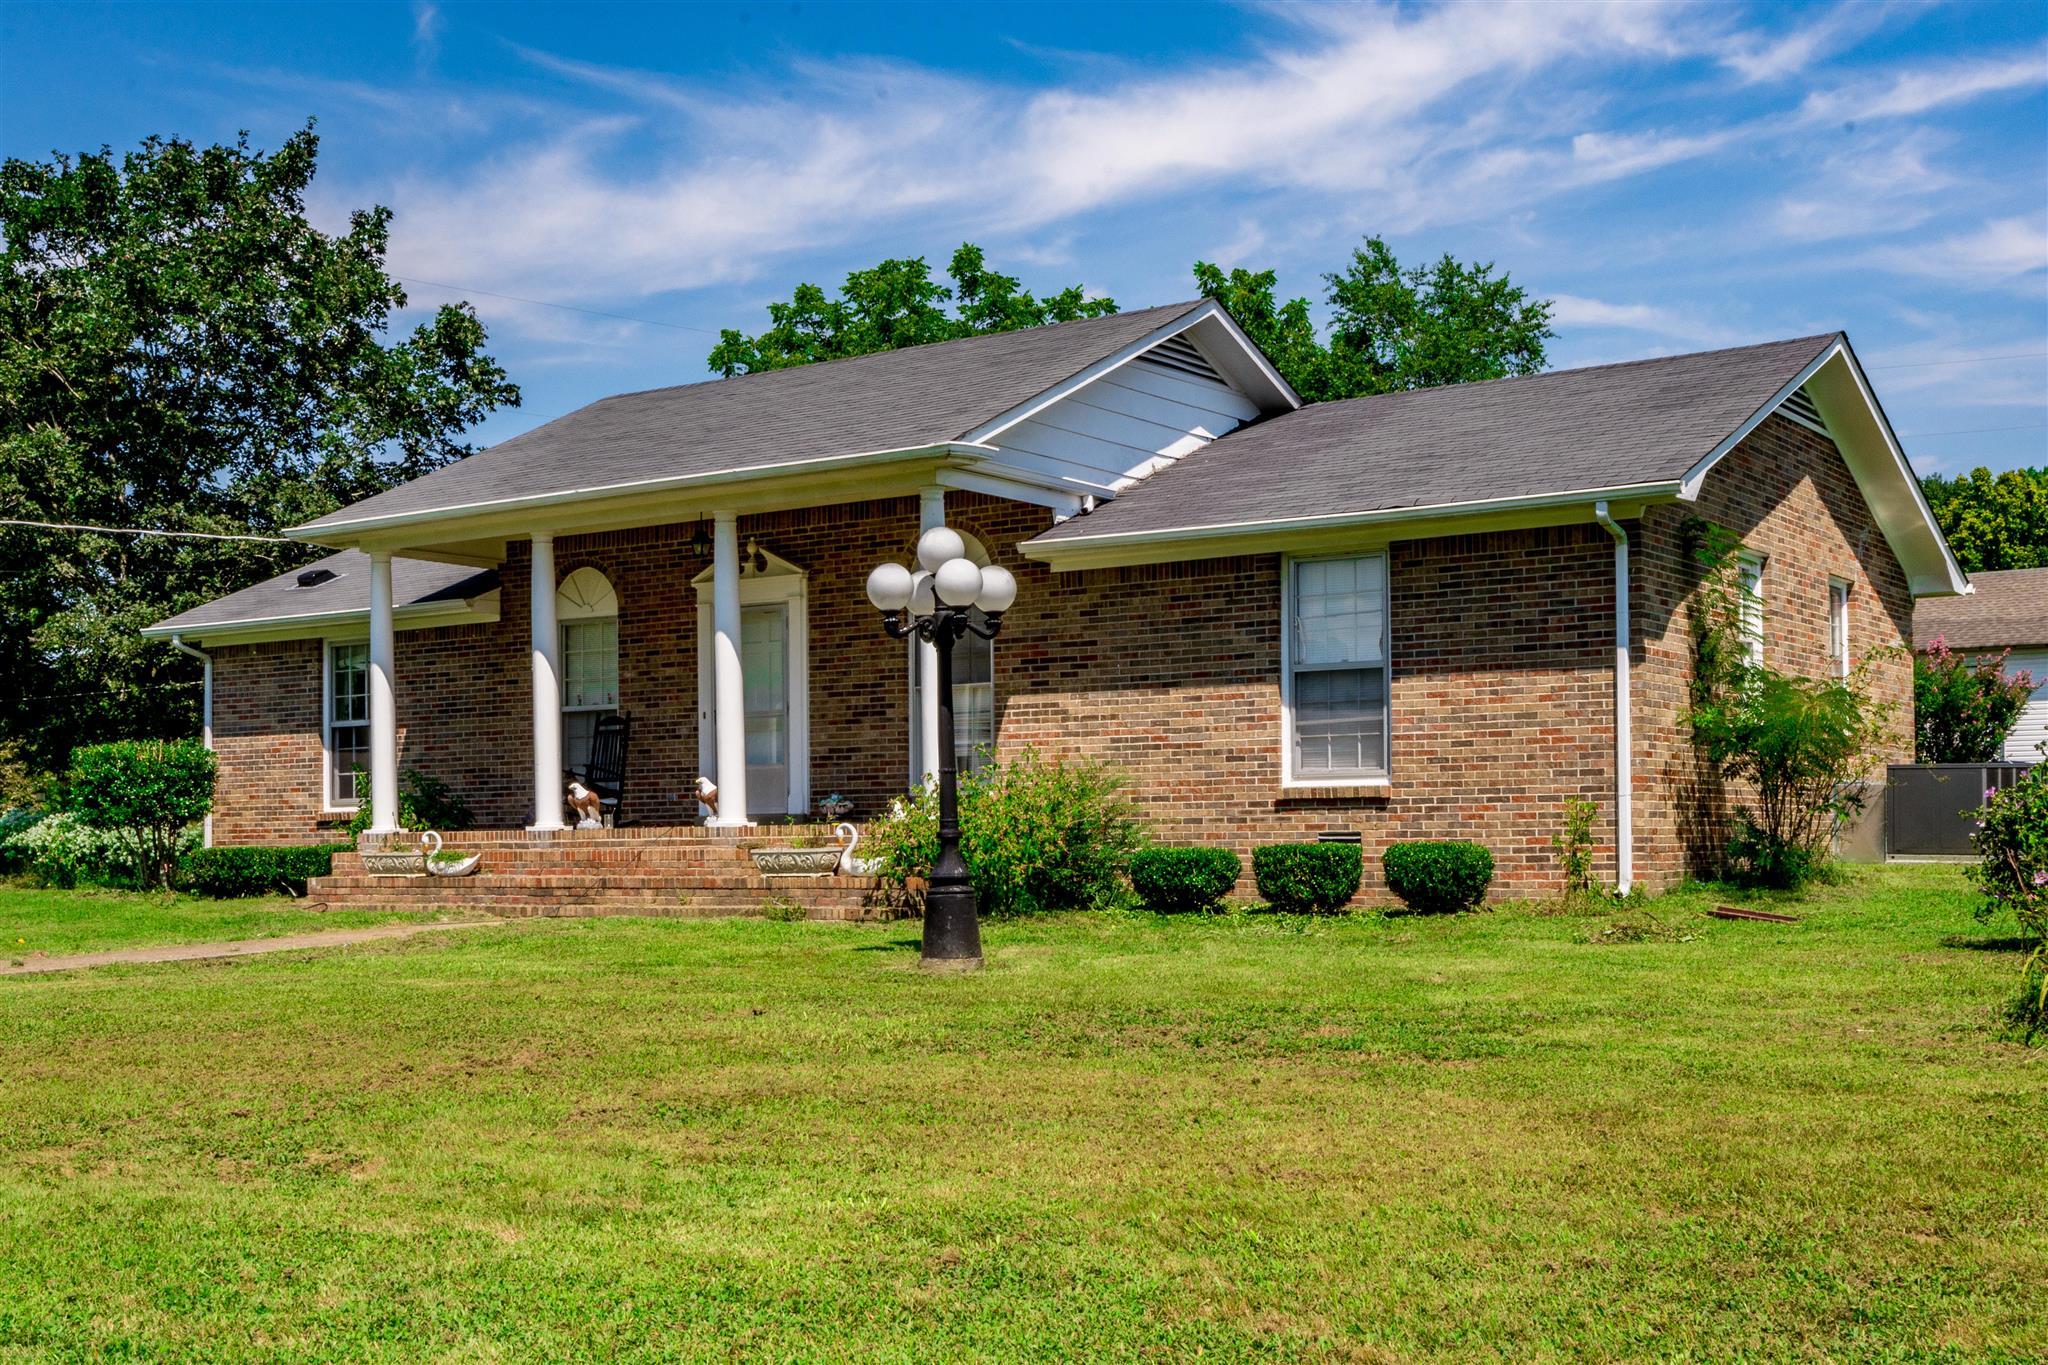 460 Rock City Rd, Pulaski, TN 38478 - Pulaski, TN real estate listing